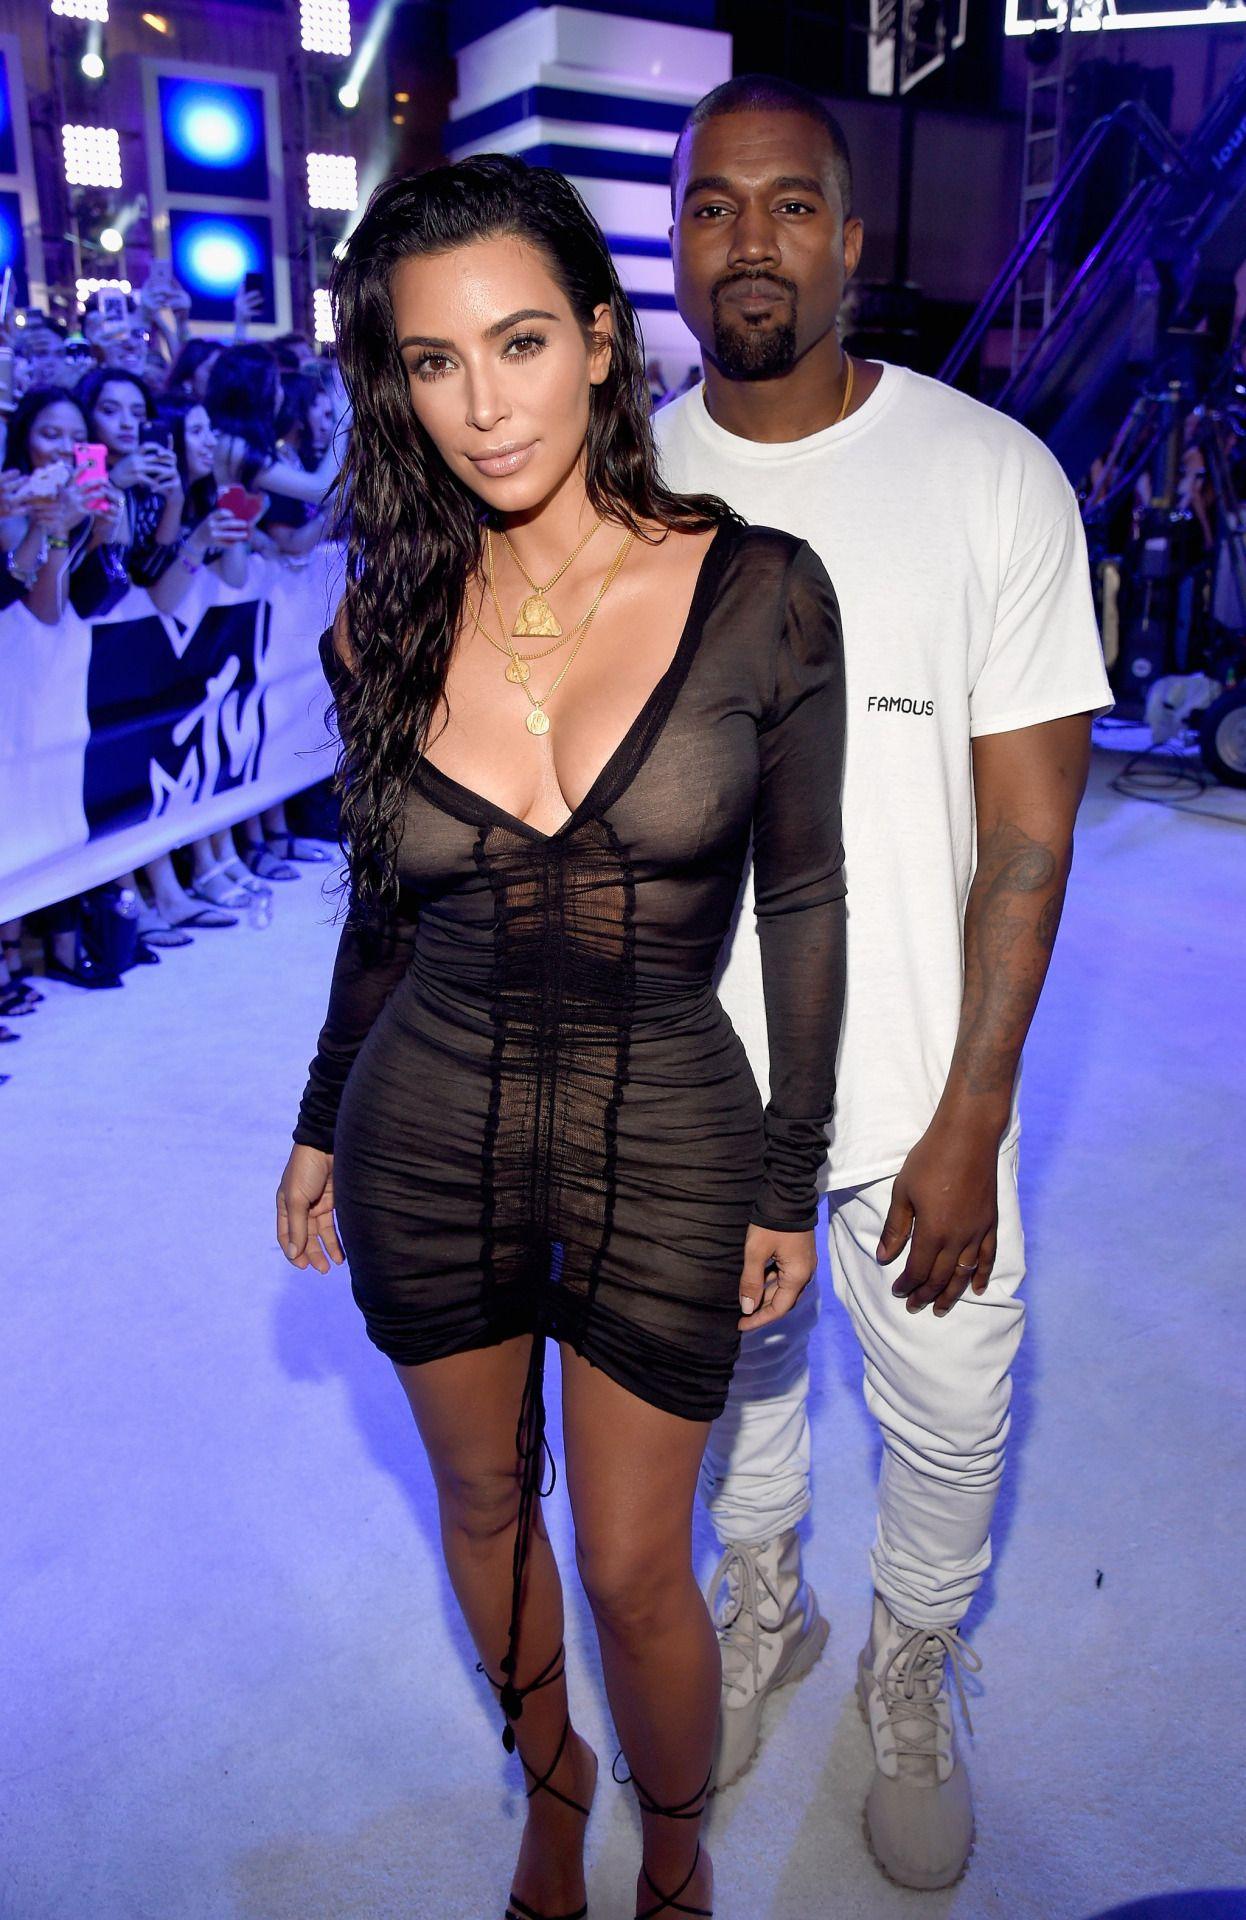 28th August 2016 Kim Kanye At The 2016 Mtv Video Music Awards Sheer Mini Dress Kim Kardashian Show Kim Kardashian And Kanye